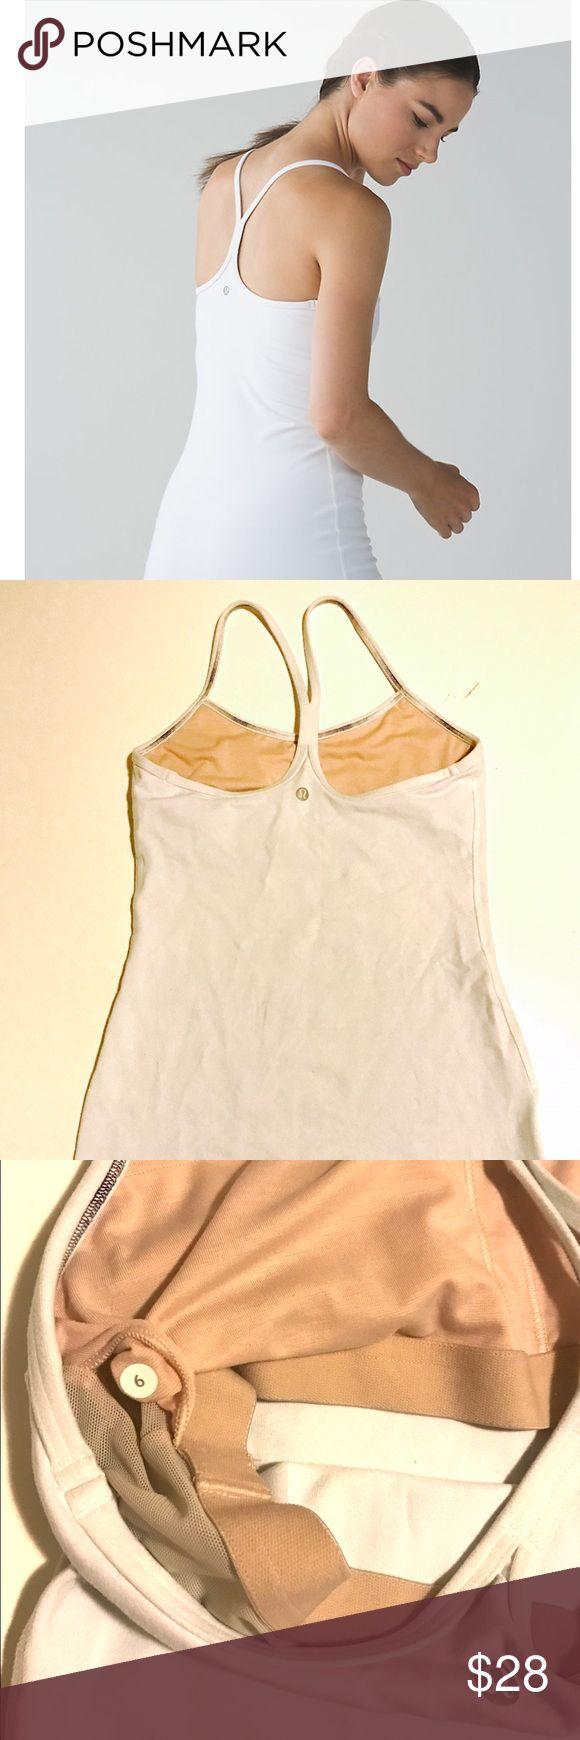 25  best ideas about Bra measuring on Pinterest   Correct bra ...